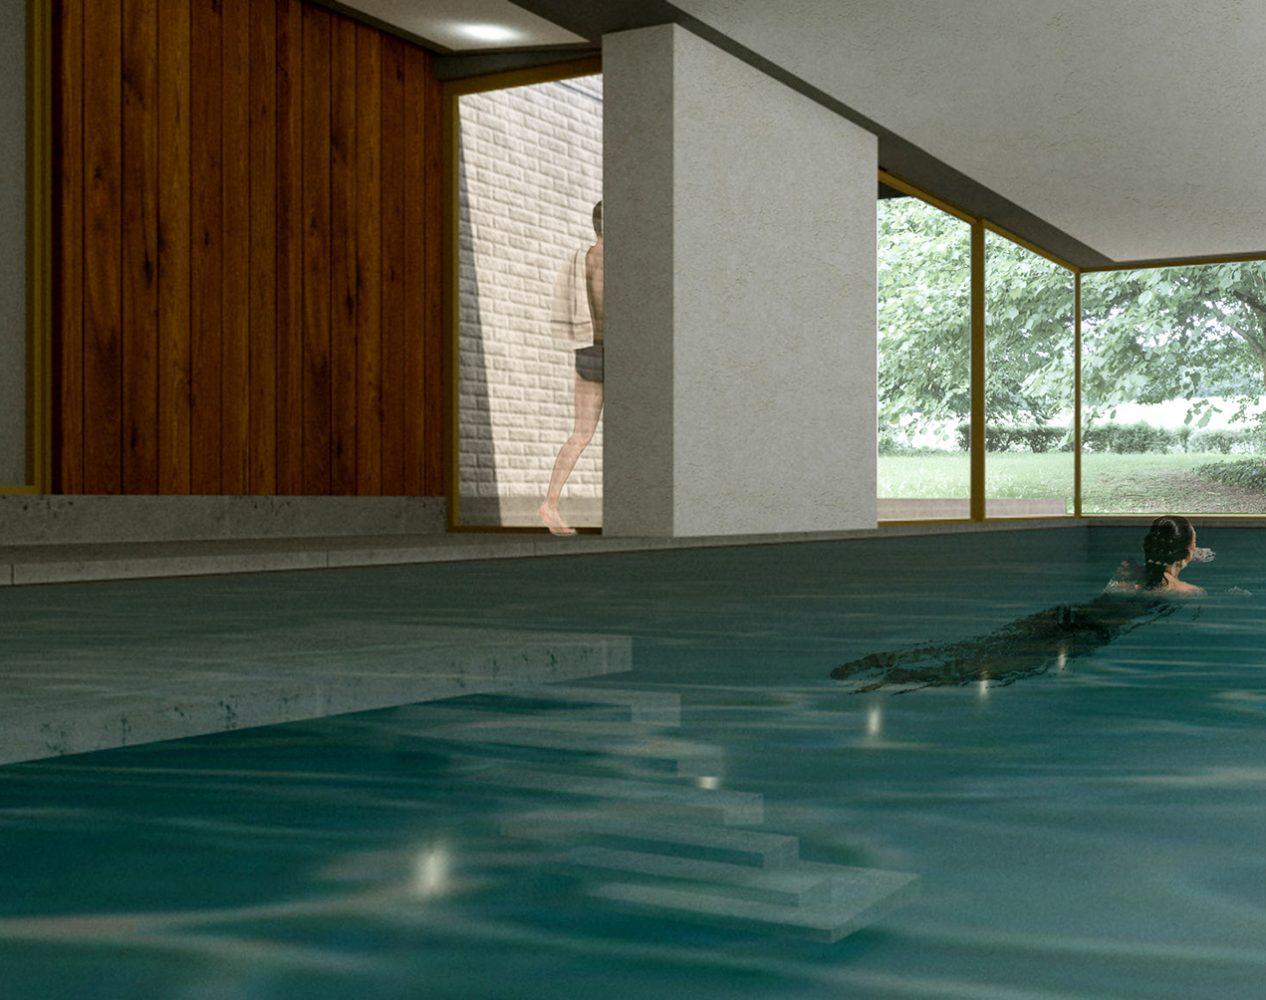 06-Pool-tomdavid-housing-shower to pool open